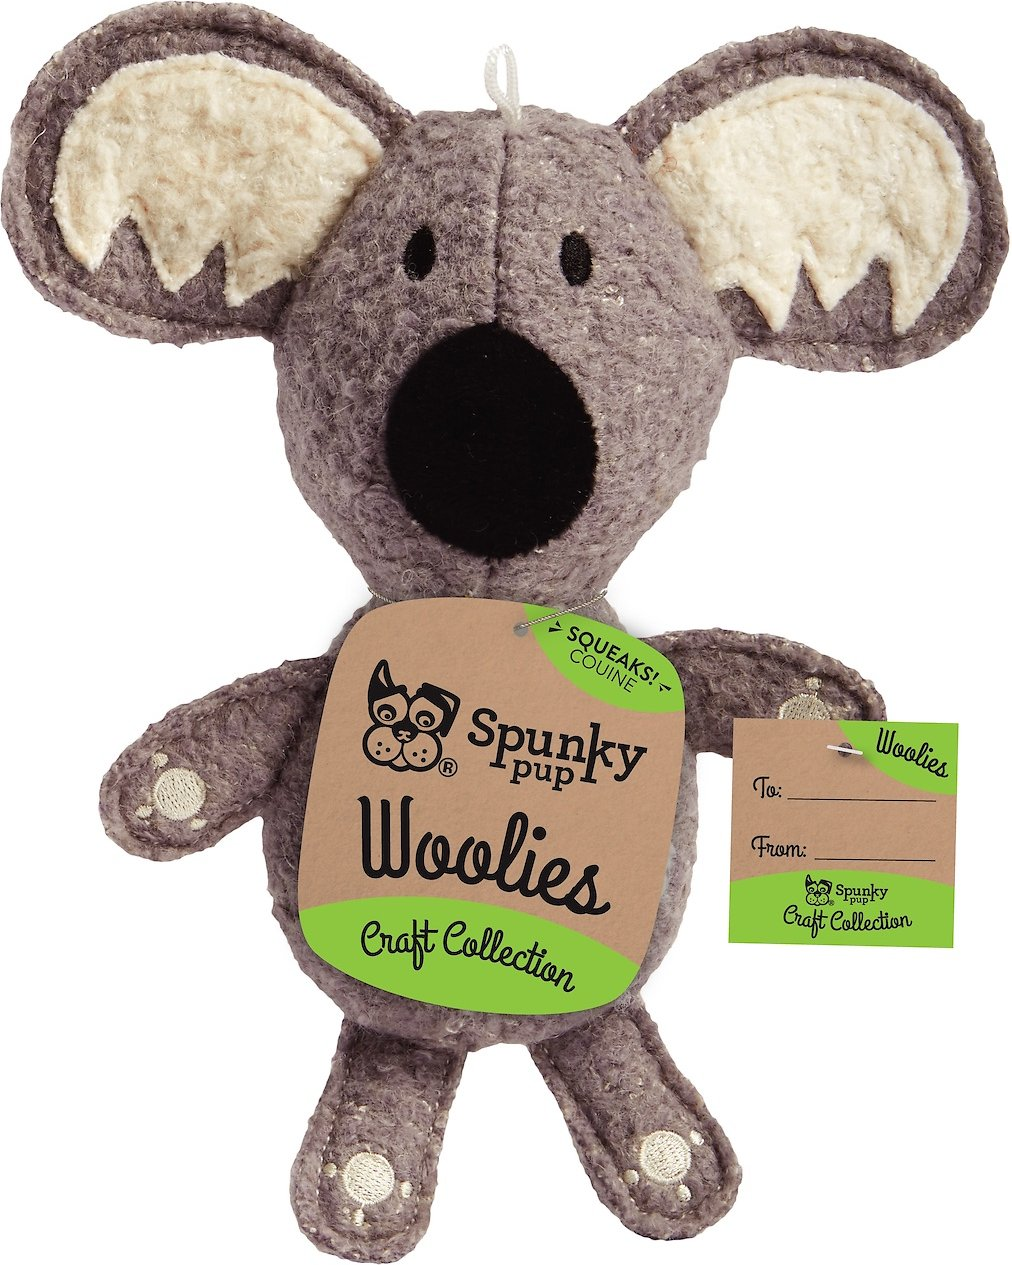 Spunky Pup Woolies Koala Dog Toy